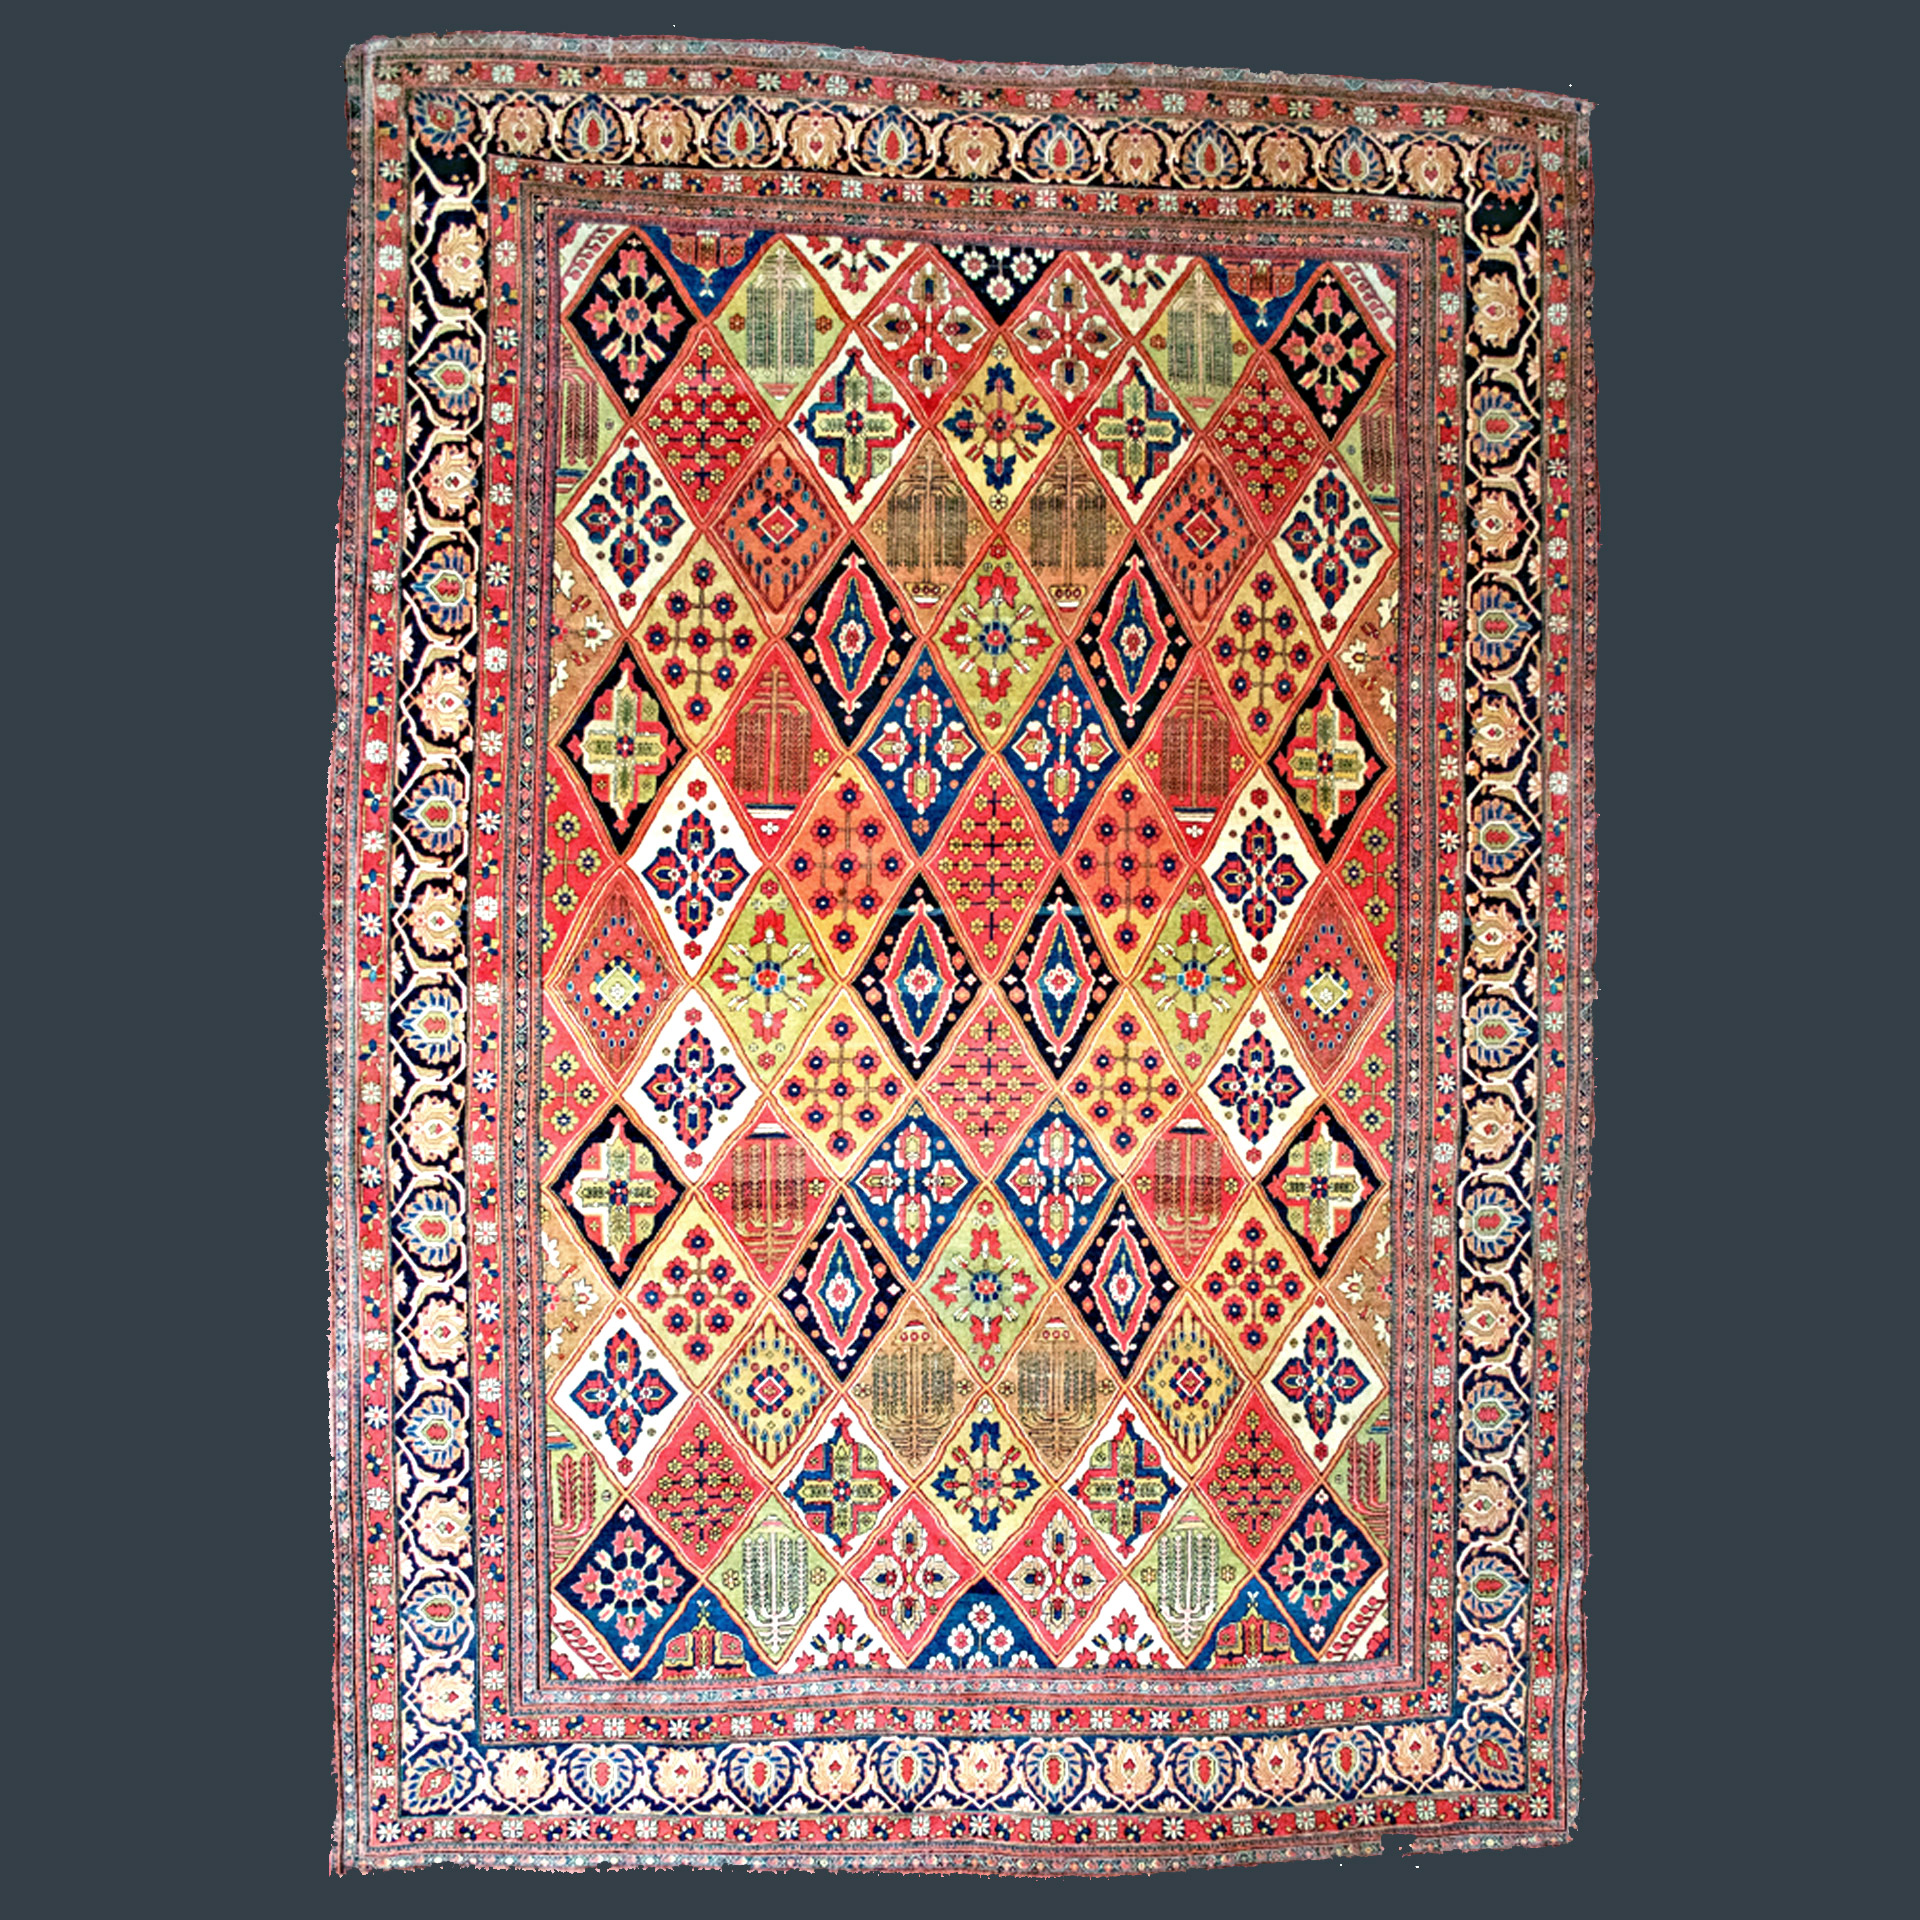 A world class antique Mohtasham Kashan carpet with a garden panel design